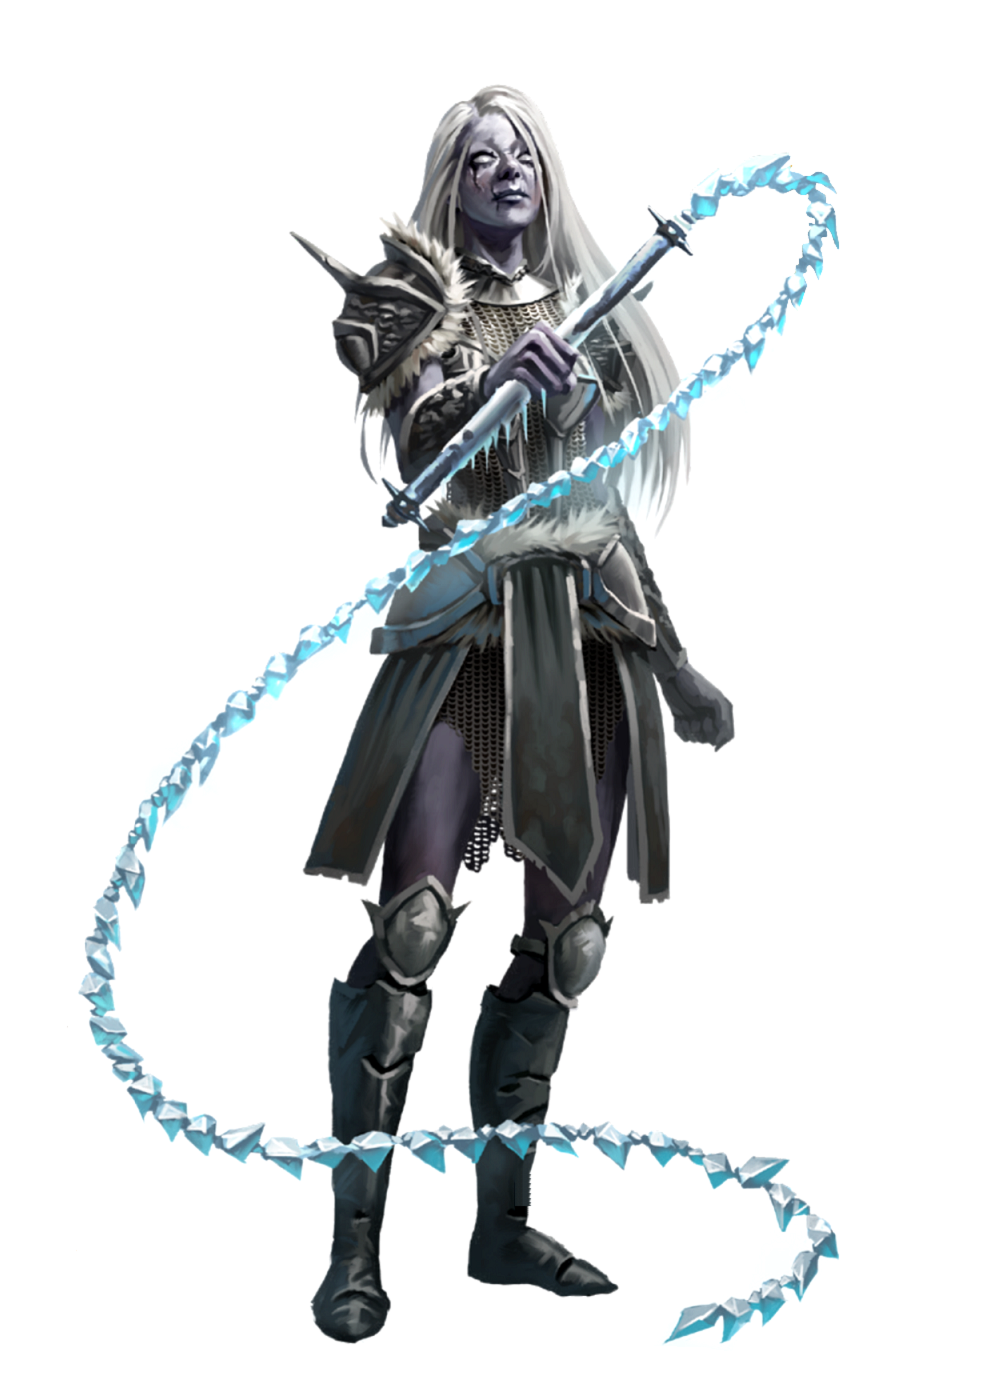 Female Shadow Giant Bard with Frost Whip - Tuirziaz